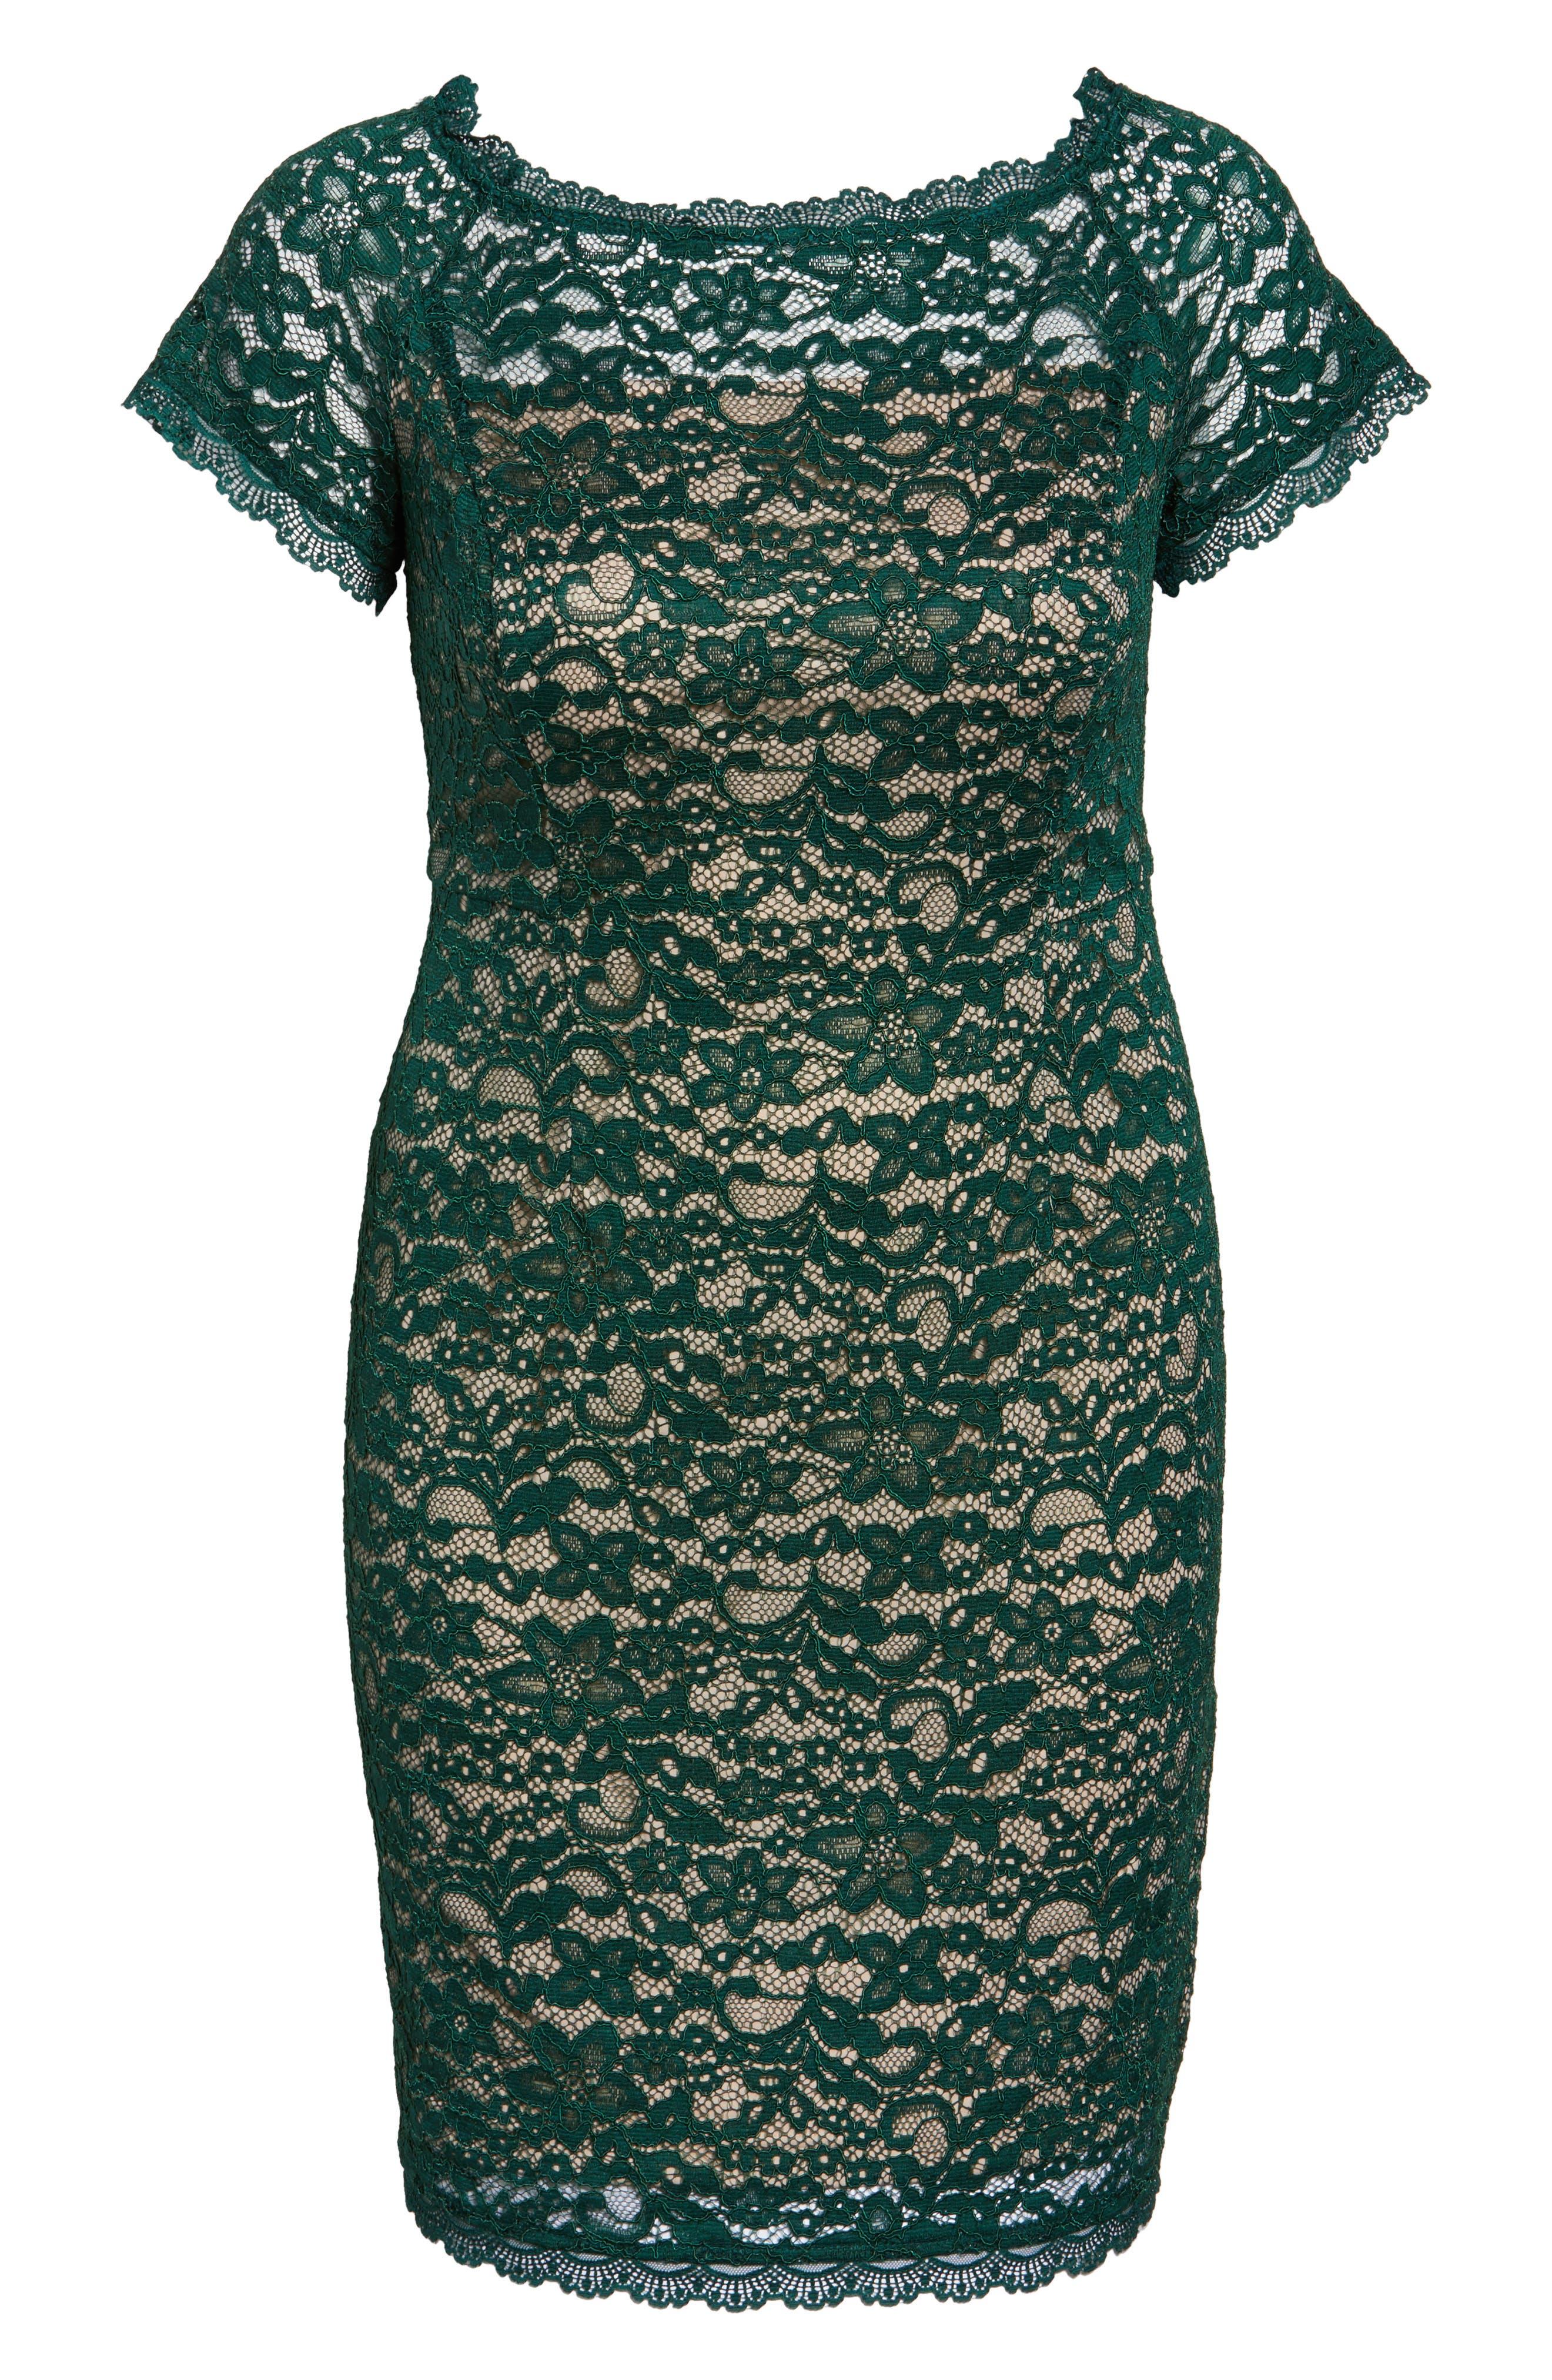 Off the Shoulder Lace Sheath Dress,                             Alternate thumbnail 6, color,                             303